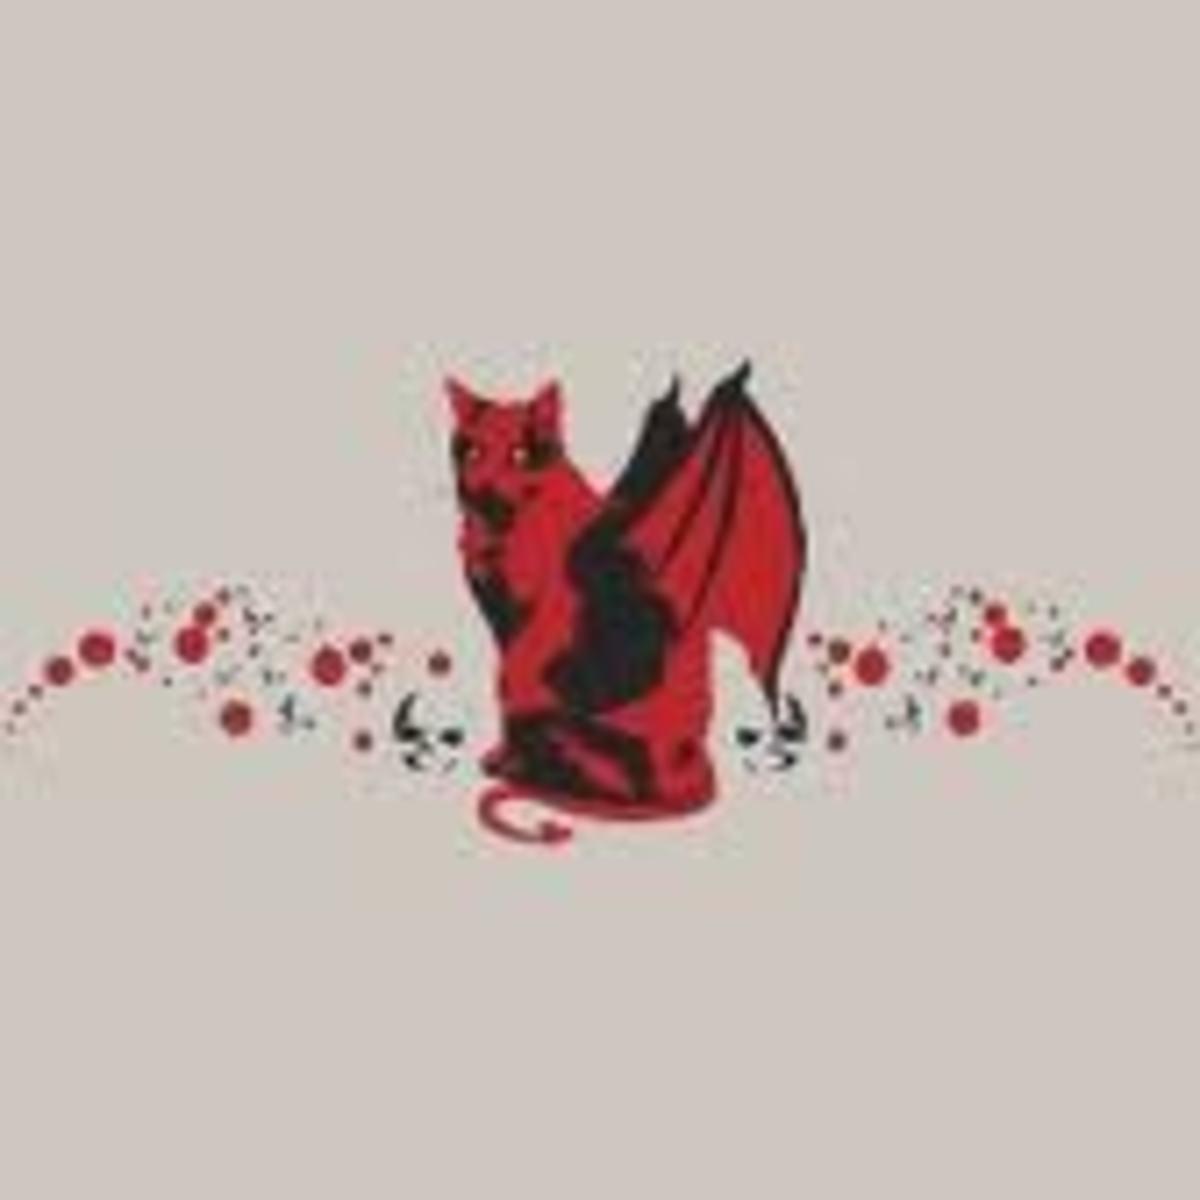 Feline winged devil